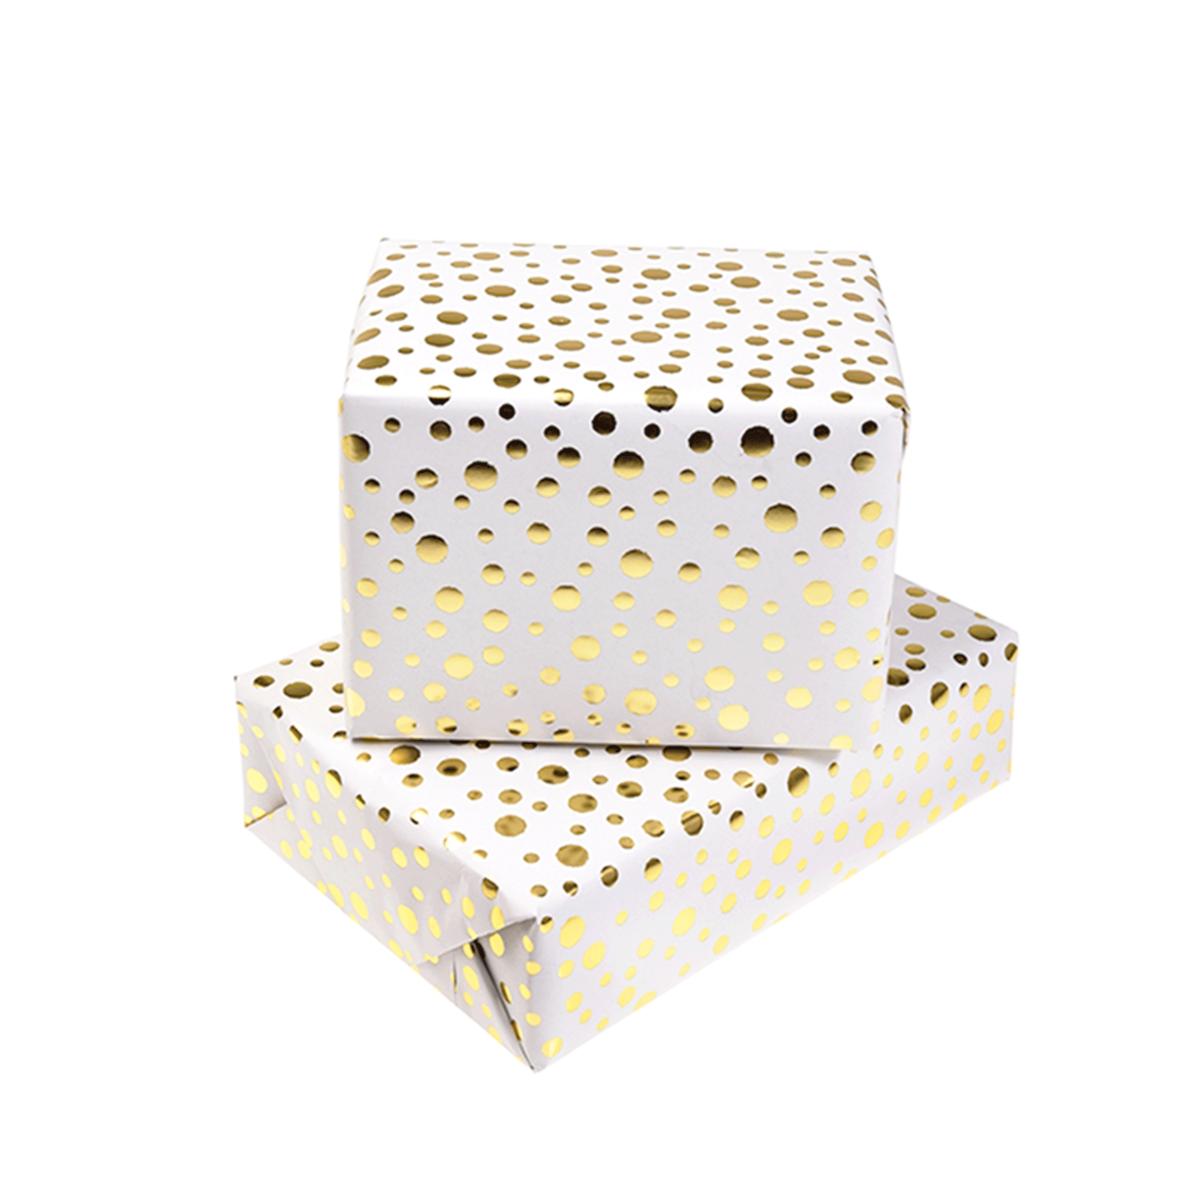 papier cadeau blanc et or emballage. Black Bedroom Furniture Sets. Home Design Ideas